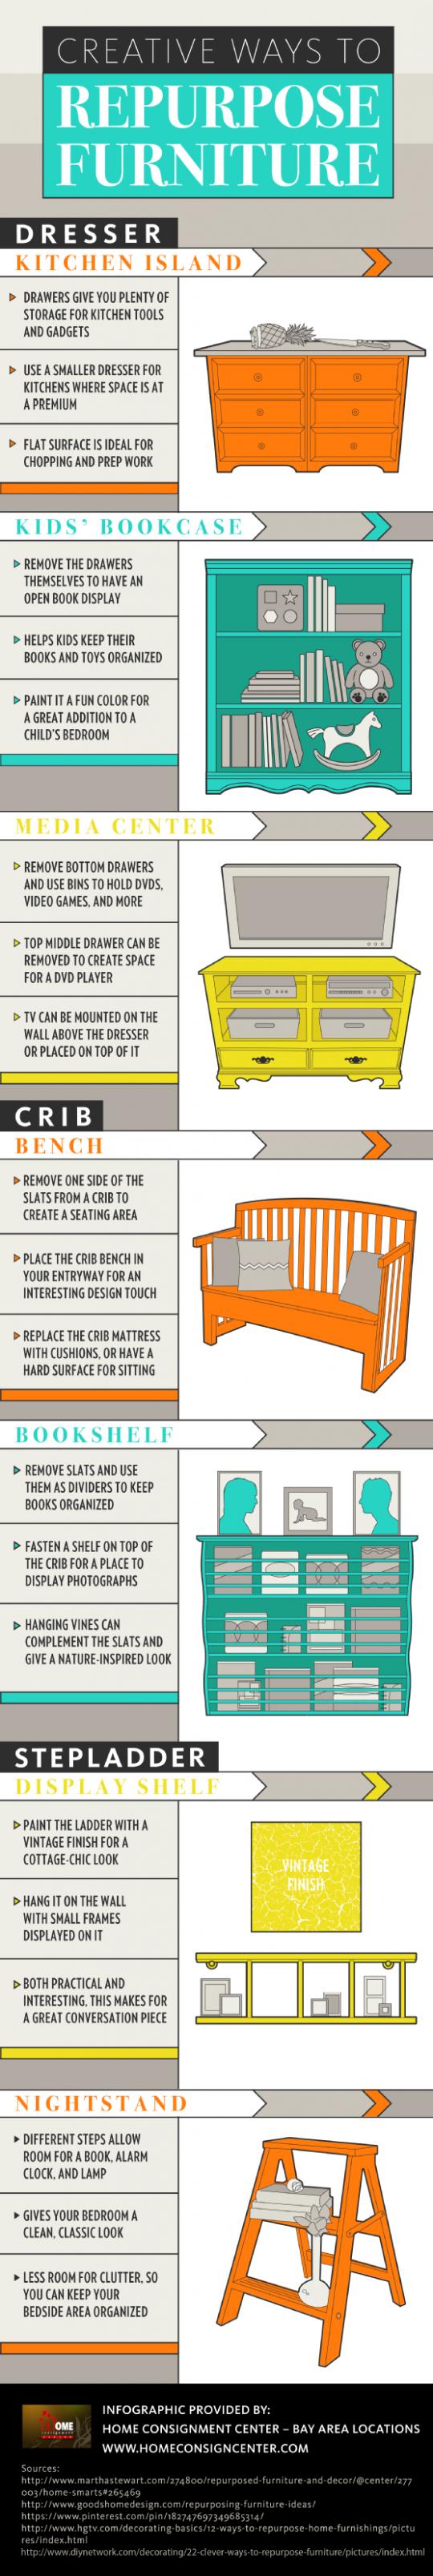 Creative Ways to Repurpose Furniture